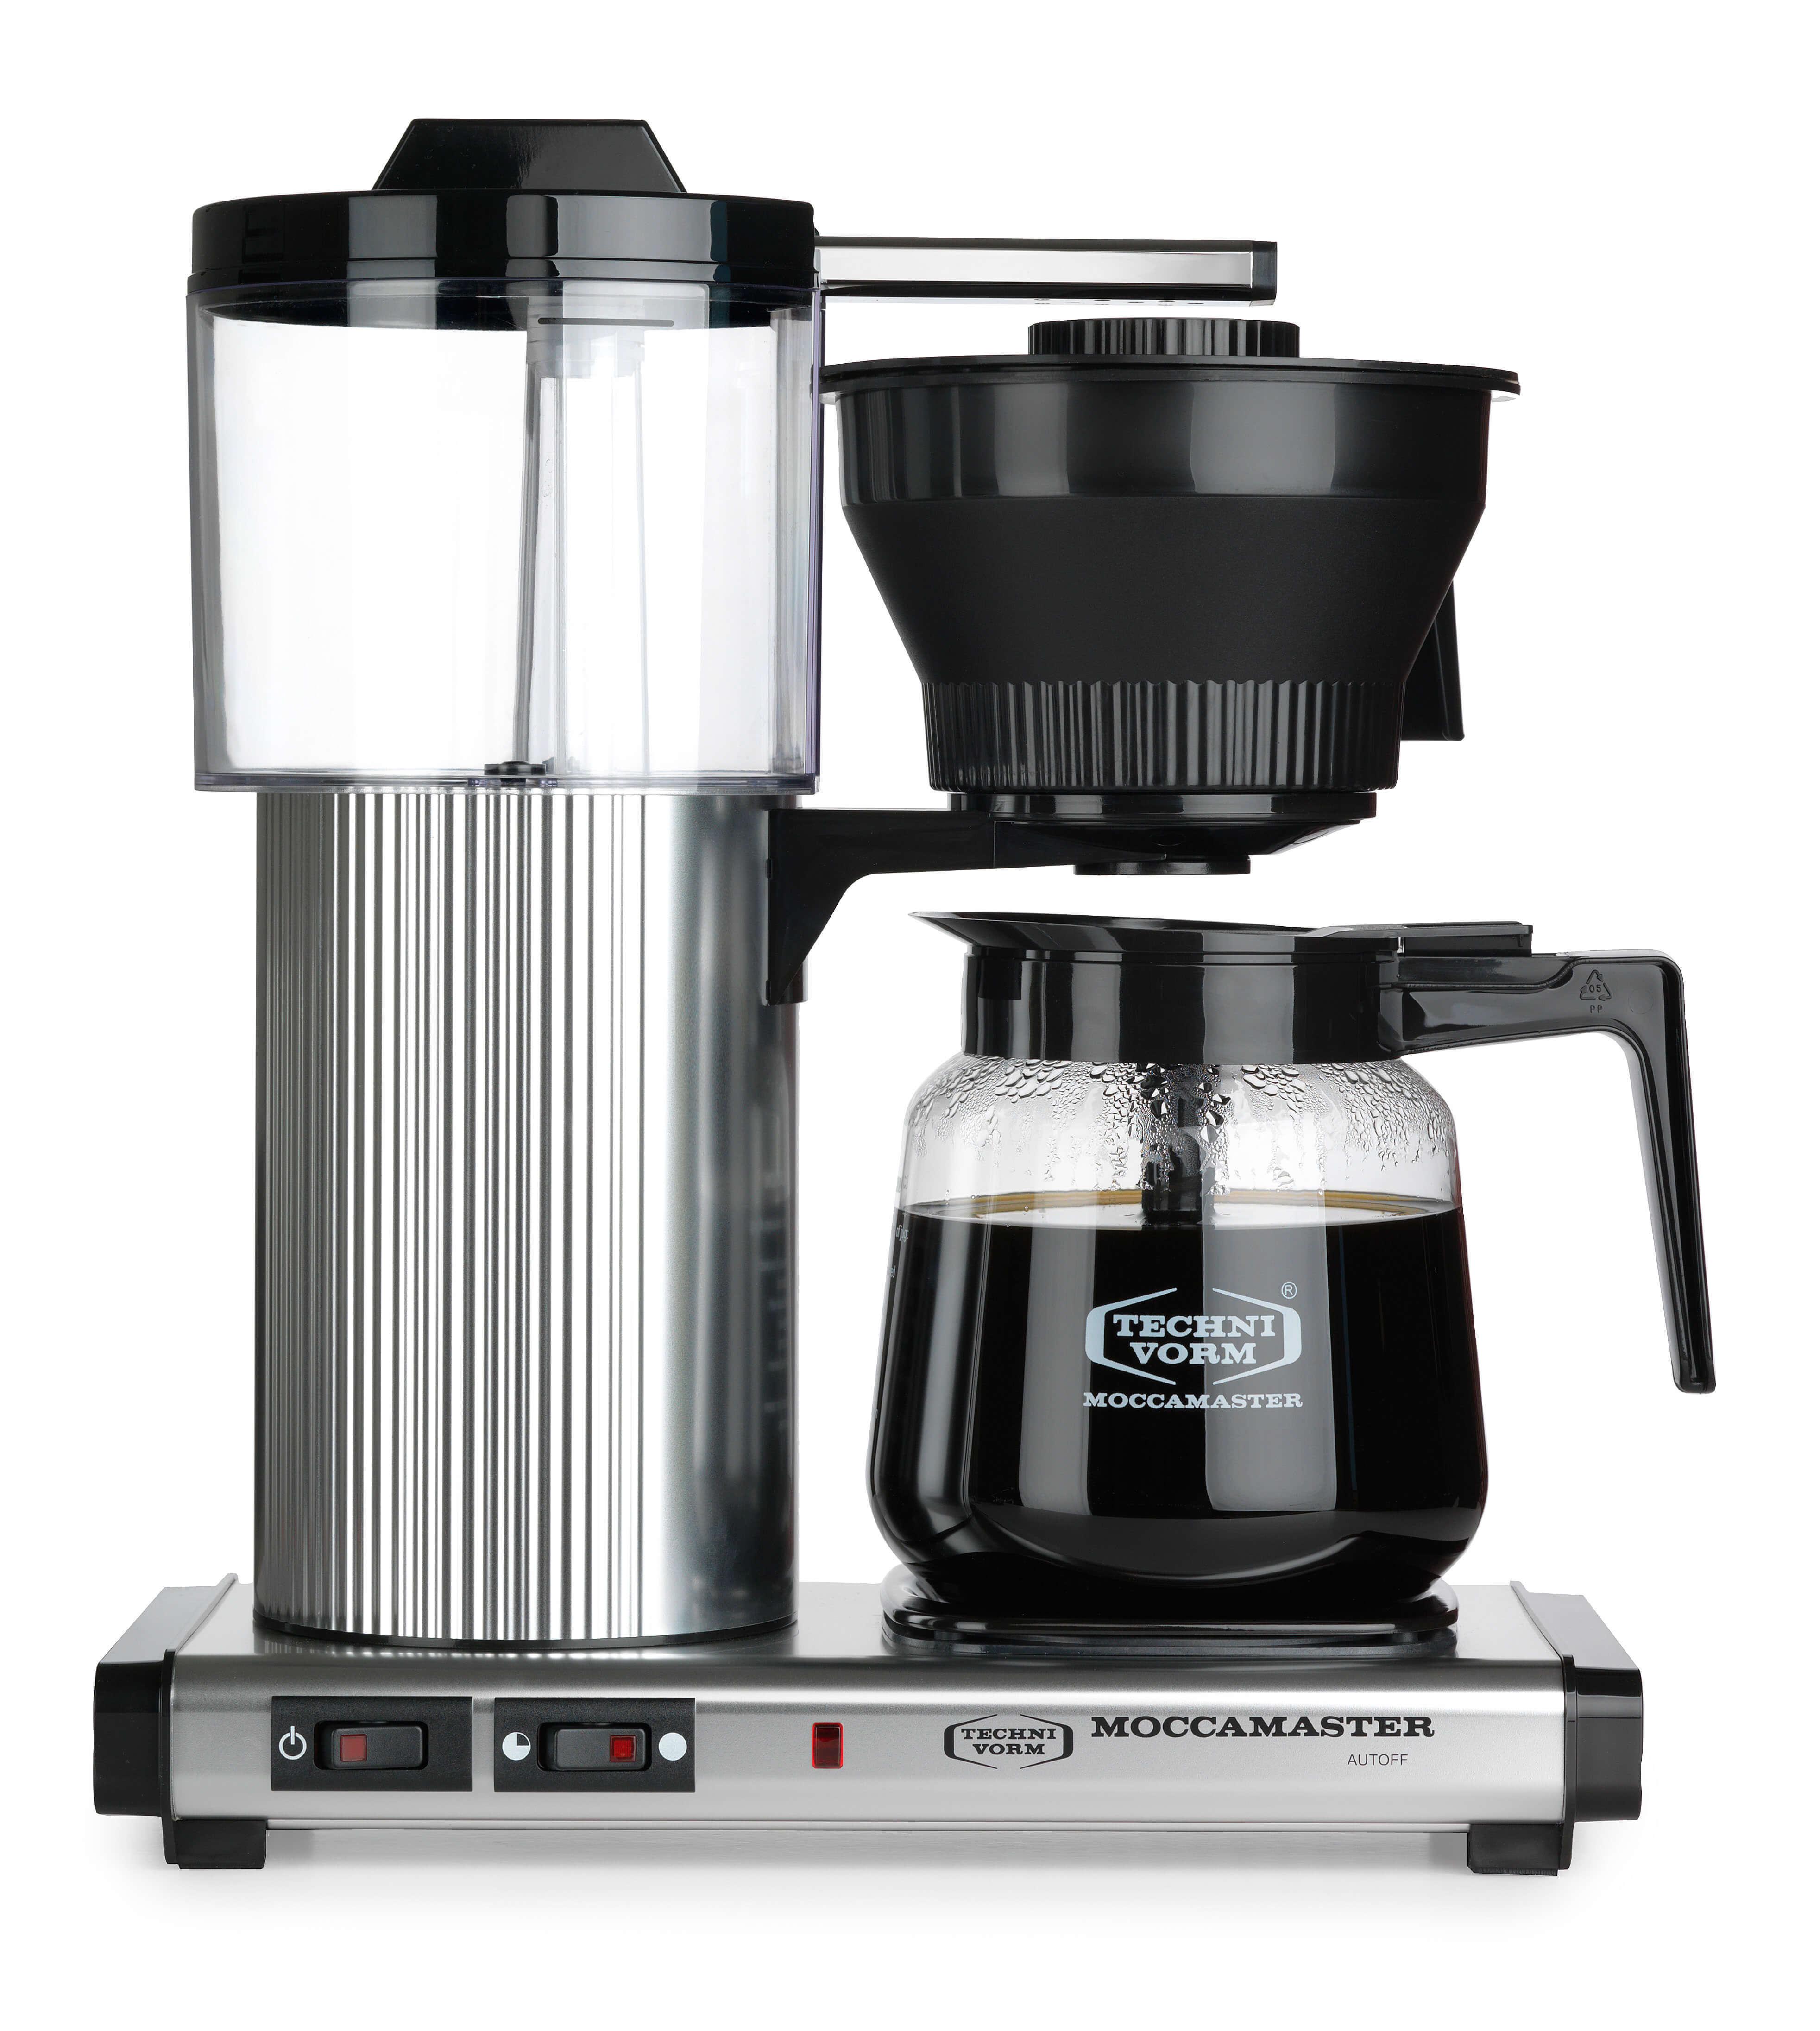 Moccamaster Kaffeeautomat CD Grand 39620 | Kamasega